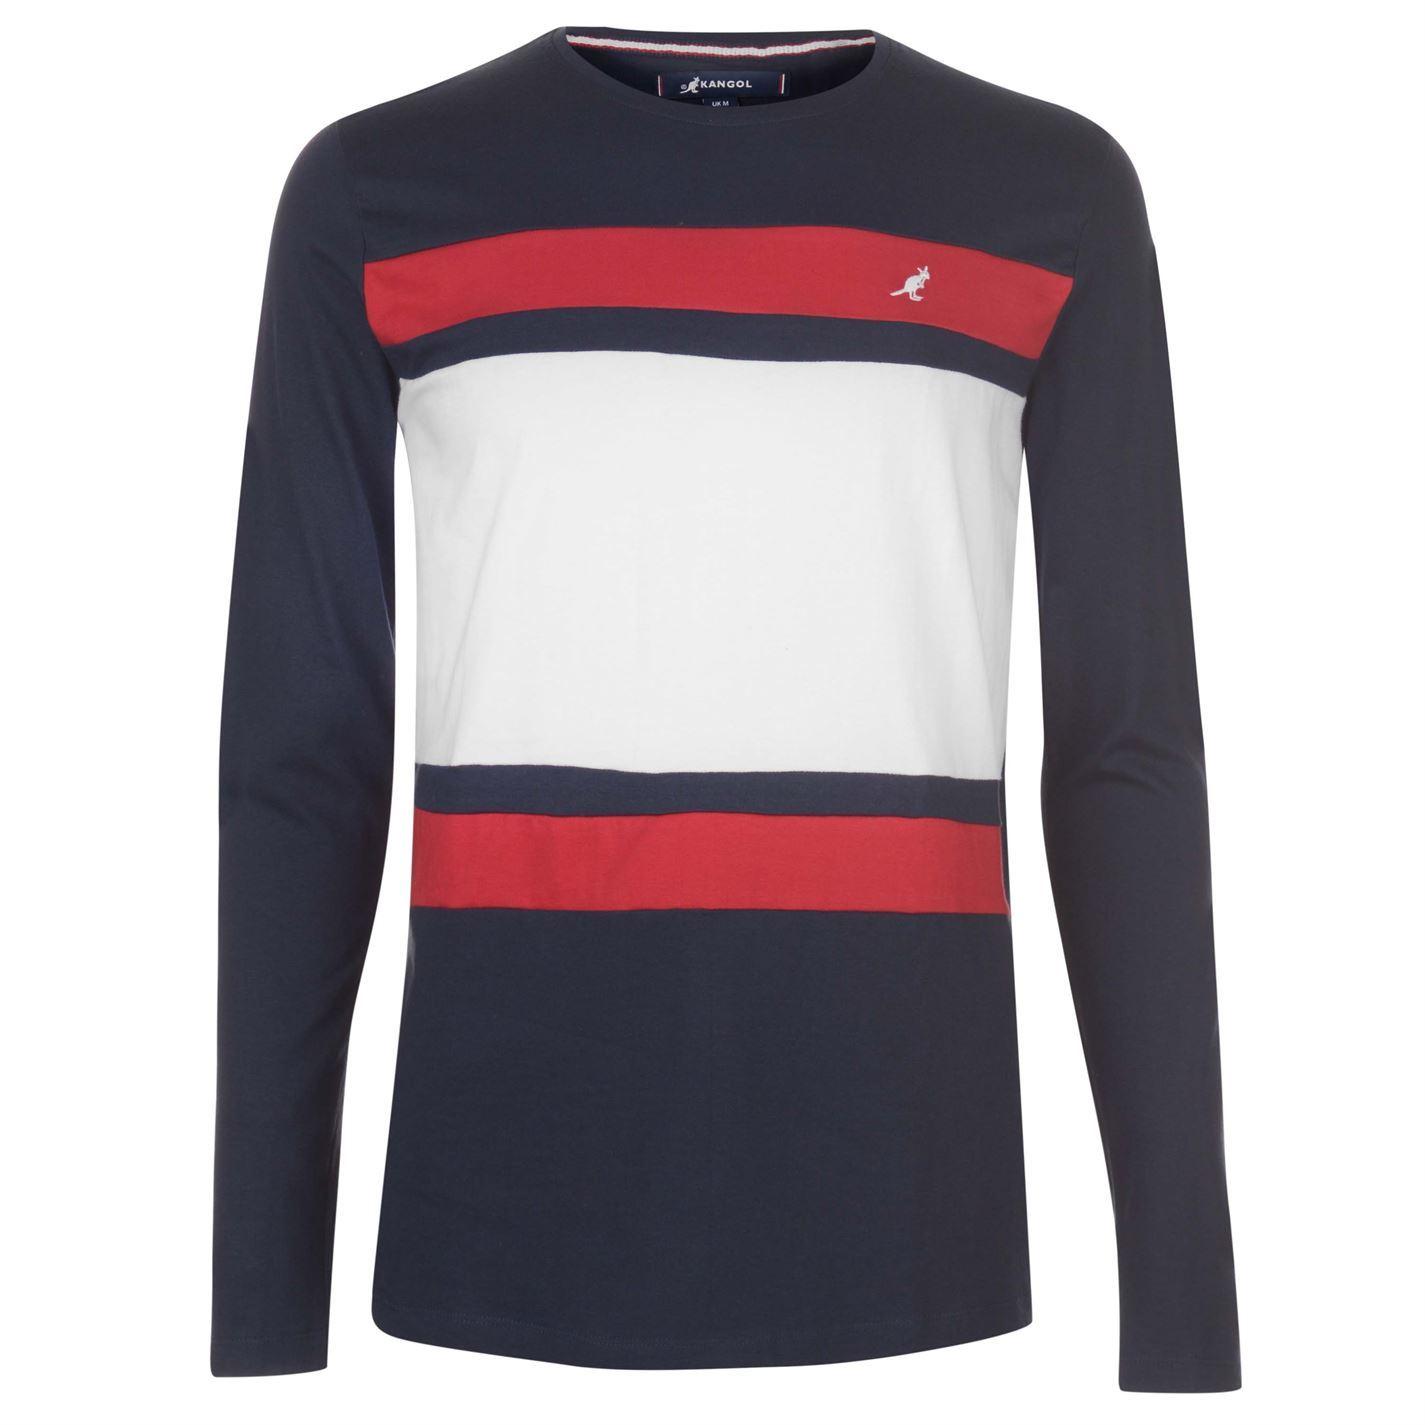 Kangol-Long-Sleeve-T-Shirt-Mens-Tee-Shirt-Top thumbnail 13